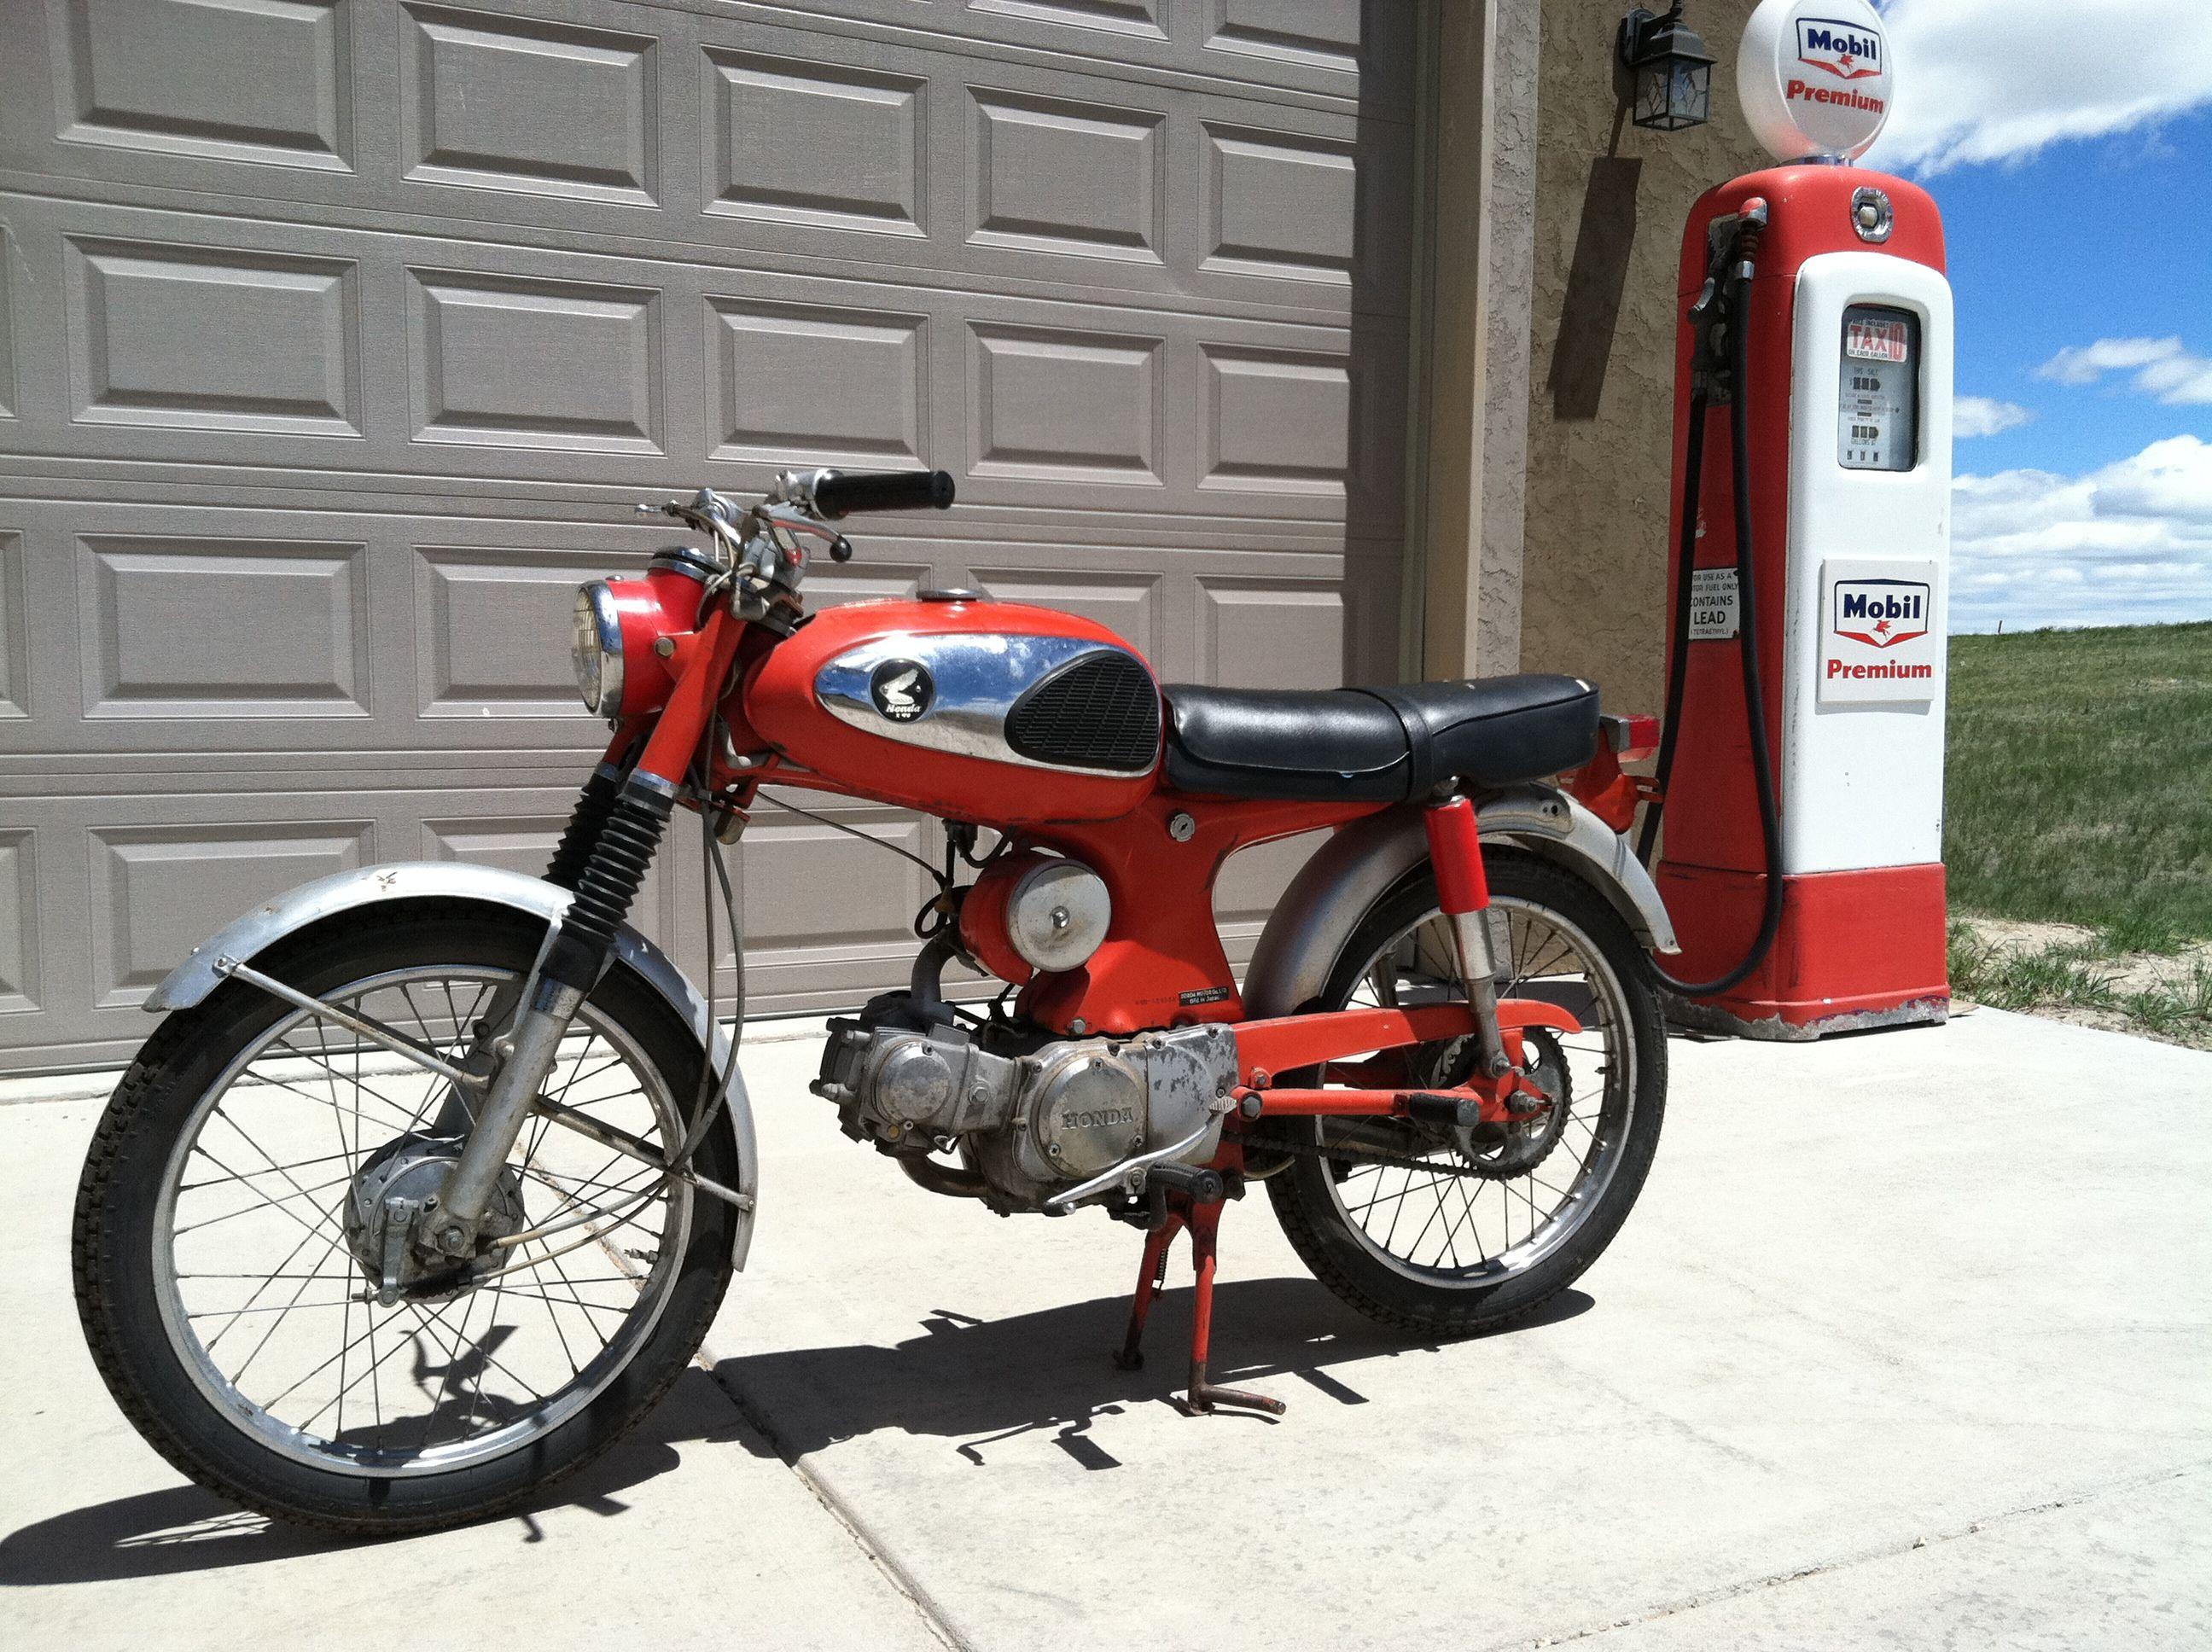 1965 honda s90 90cc ohc engine w 4spd tranny top speed 65 mph